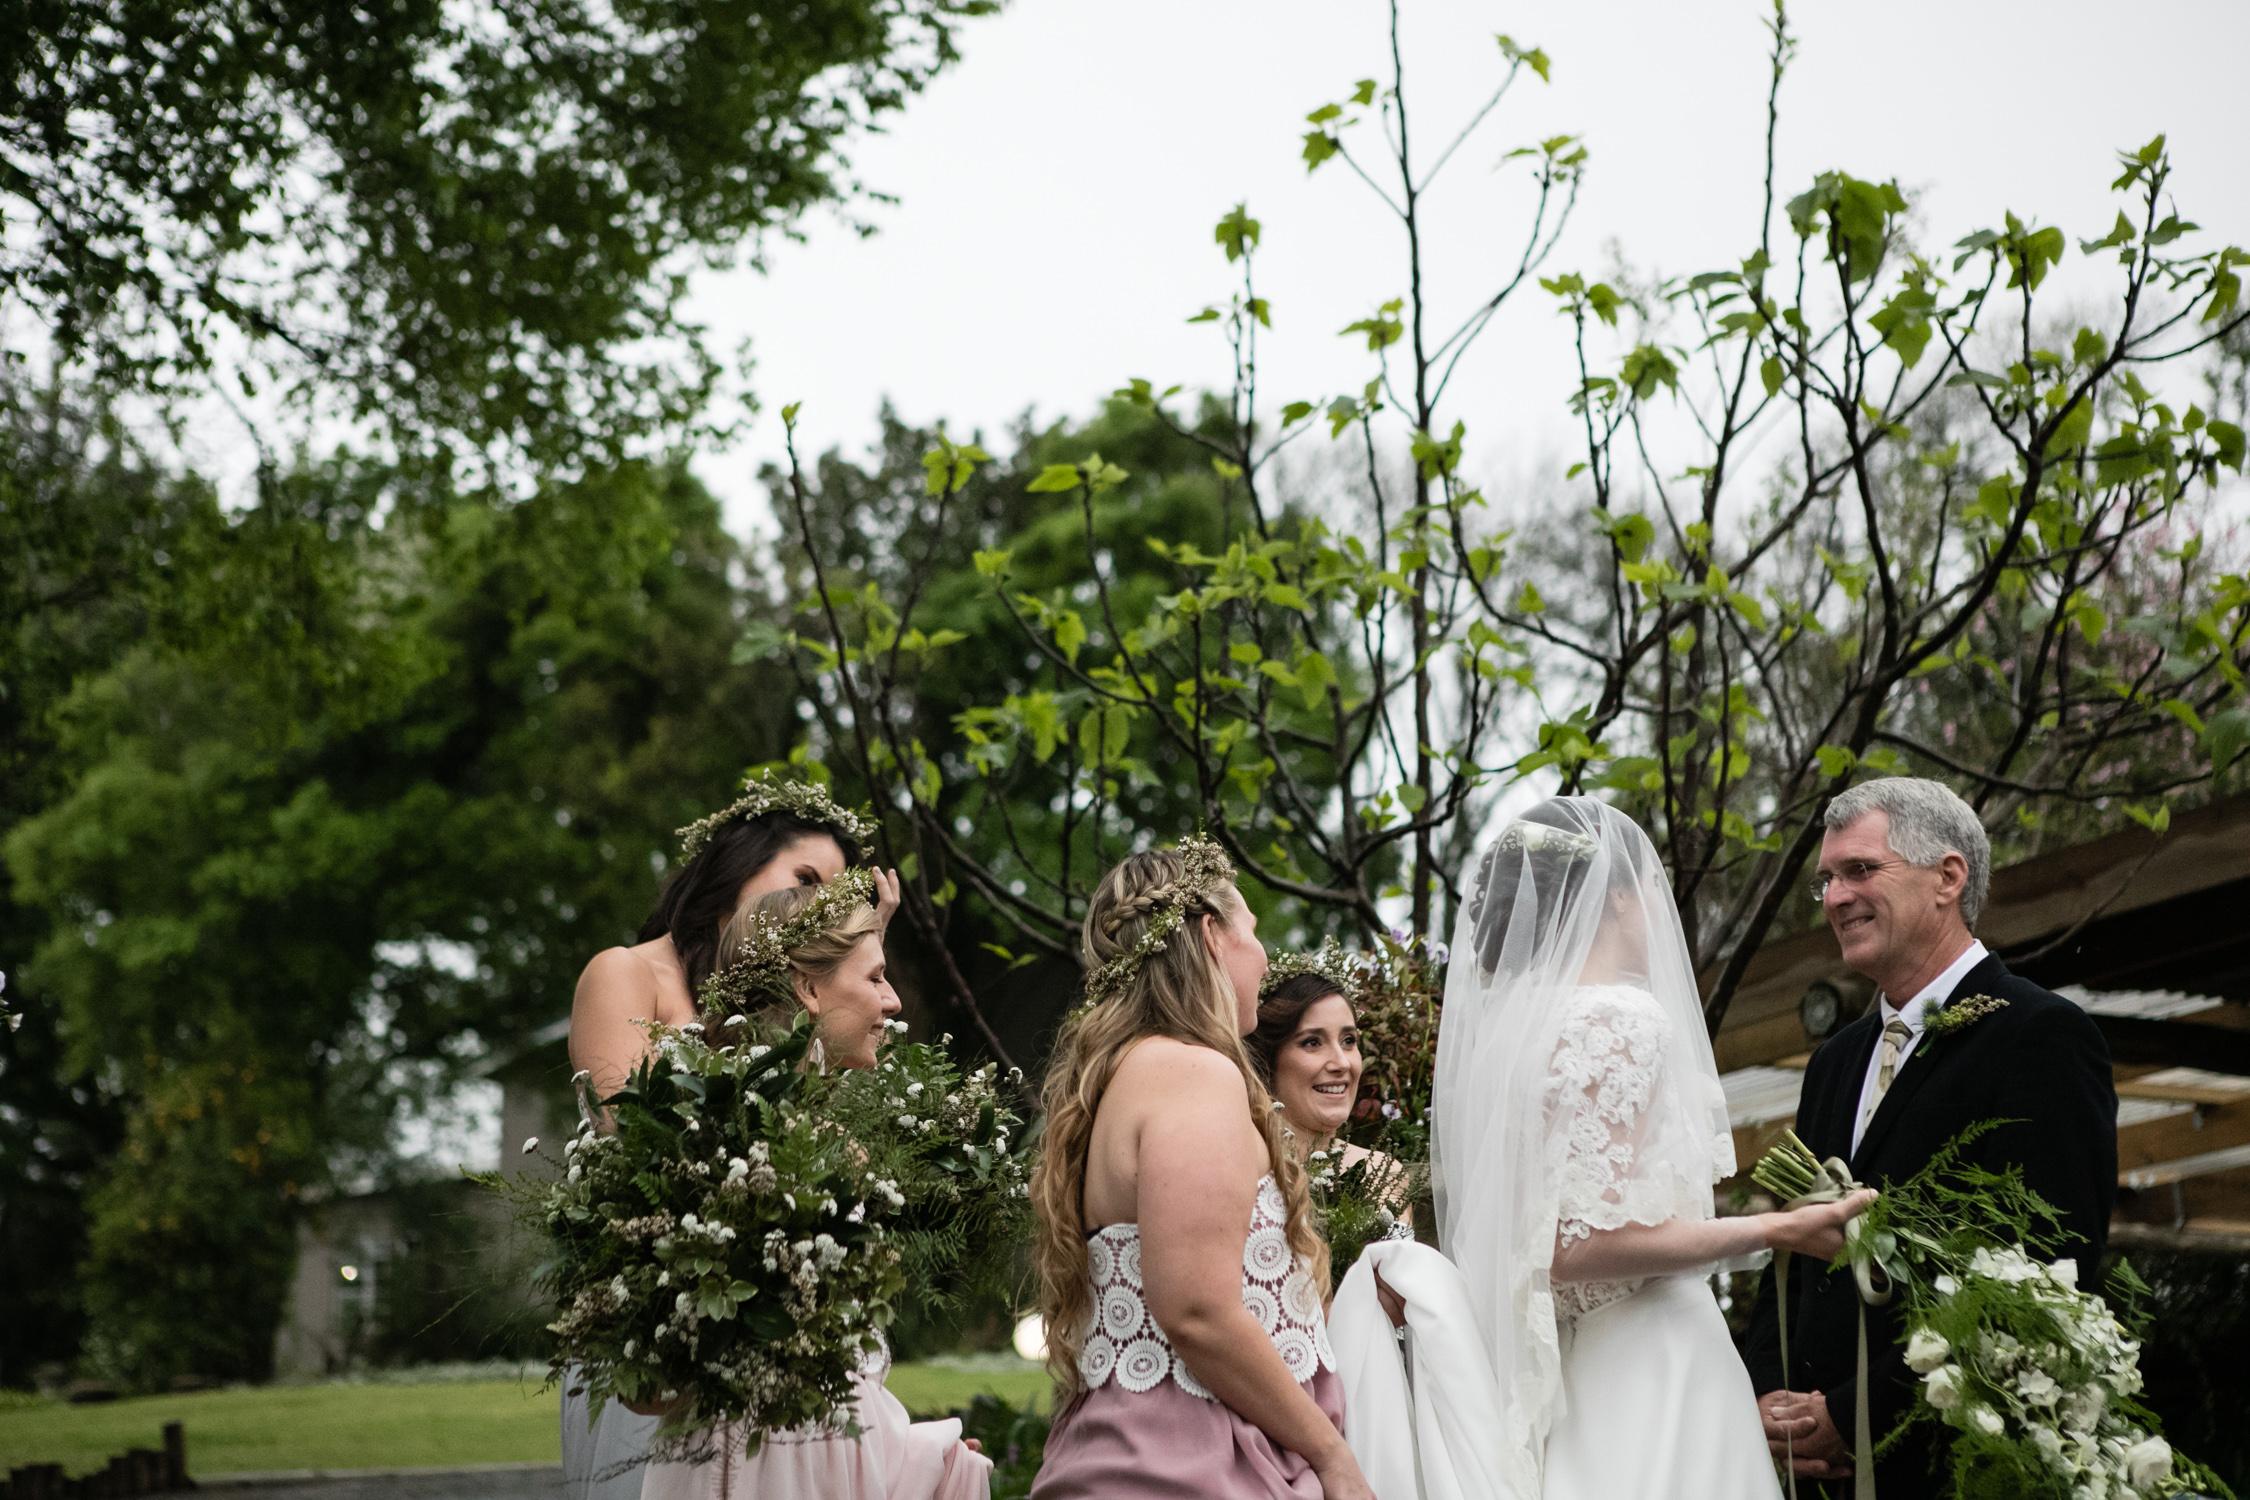 heisvisual-wedding-photographers-documentary-midlands-south-africa037.jpg